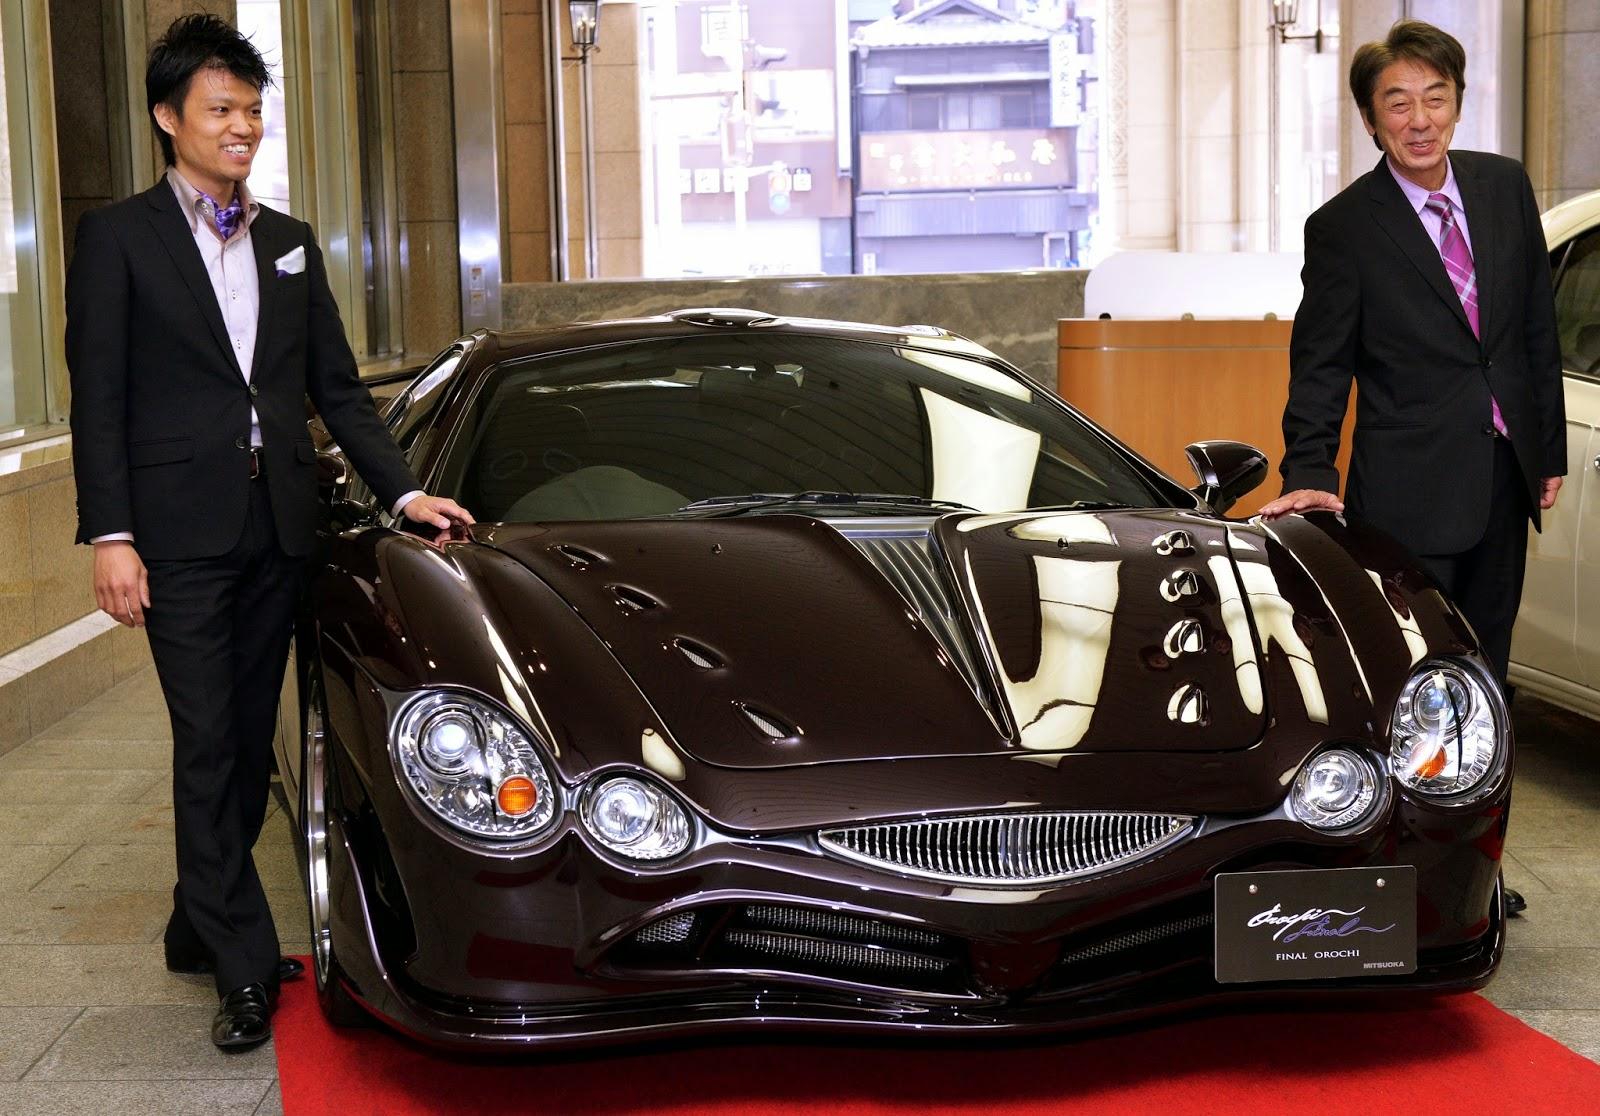 Mitsuoka Final Orochi, Sports Cars, Yamata no Orochi, Mitsuoka Motors, Mitsuoka Orochi, Auto Industry, Orochi, Fashion-Super Car, Japan, Tokyo, Luxury Cars, Akio Mitsuoka, Car Designer, Takanori Aoki,